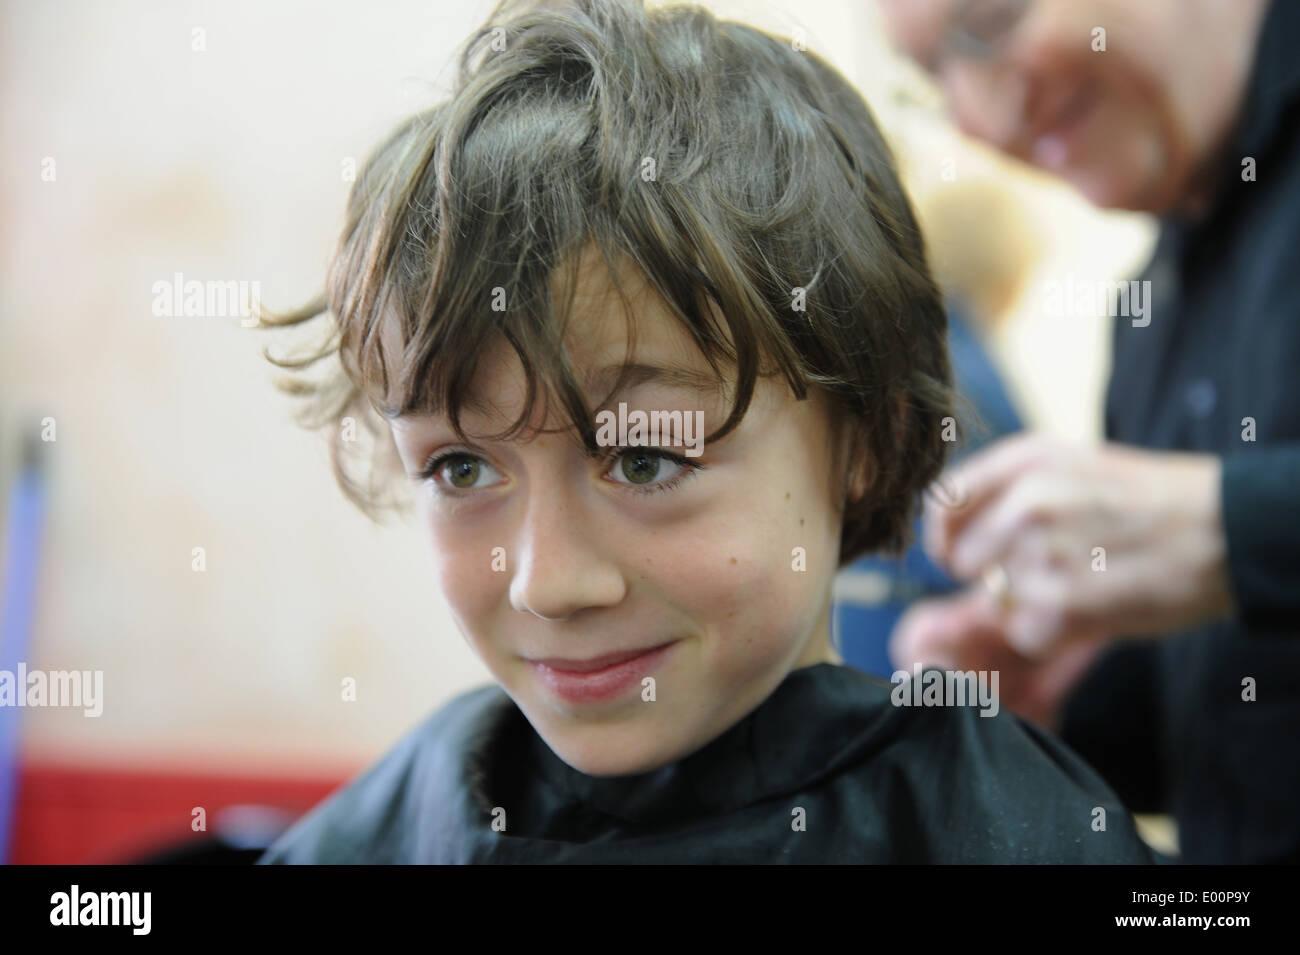 9 Year Old Schoolboy Having A Haircut In Barbers In Great Ayton